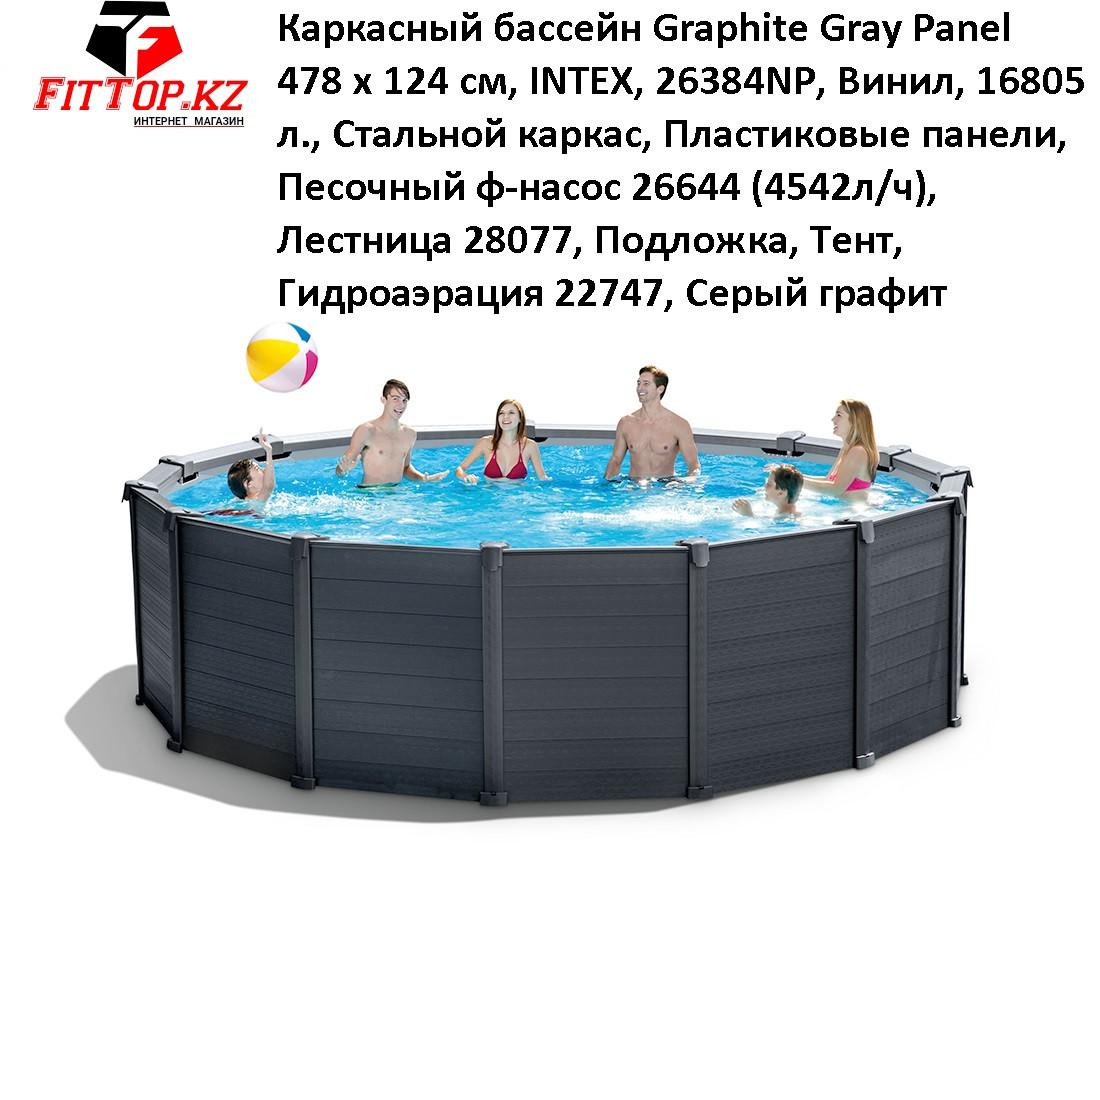 Каркасный бассейн Graphite Gray Panel 478 х 124 см, INTEX, 26384NP, Винил, 16805 л